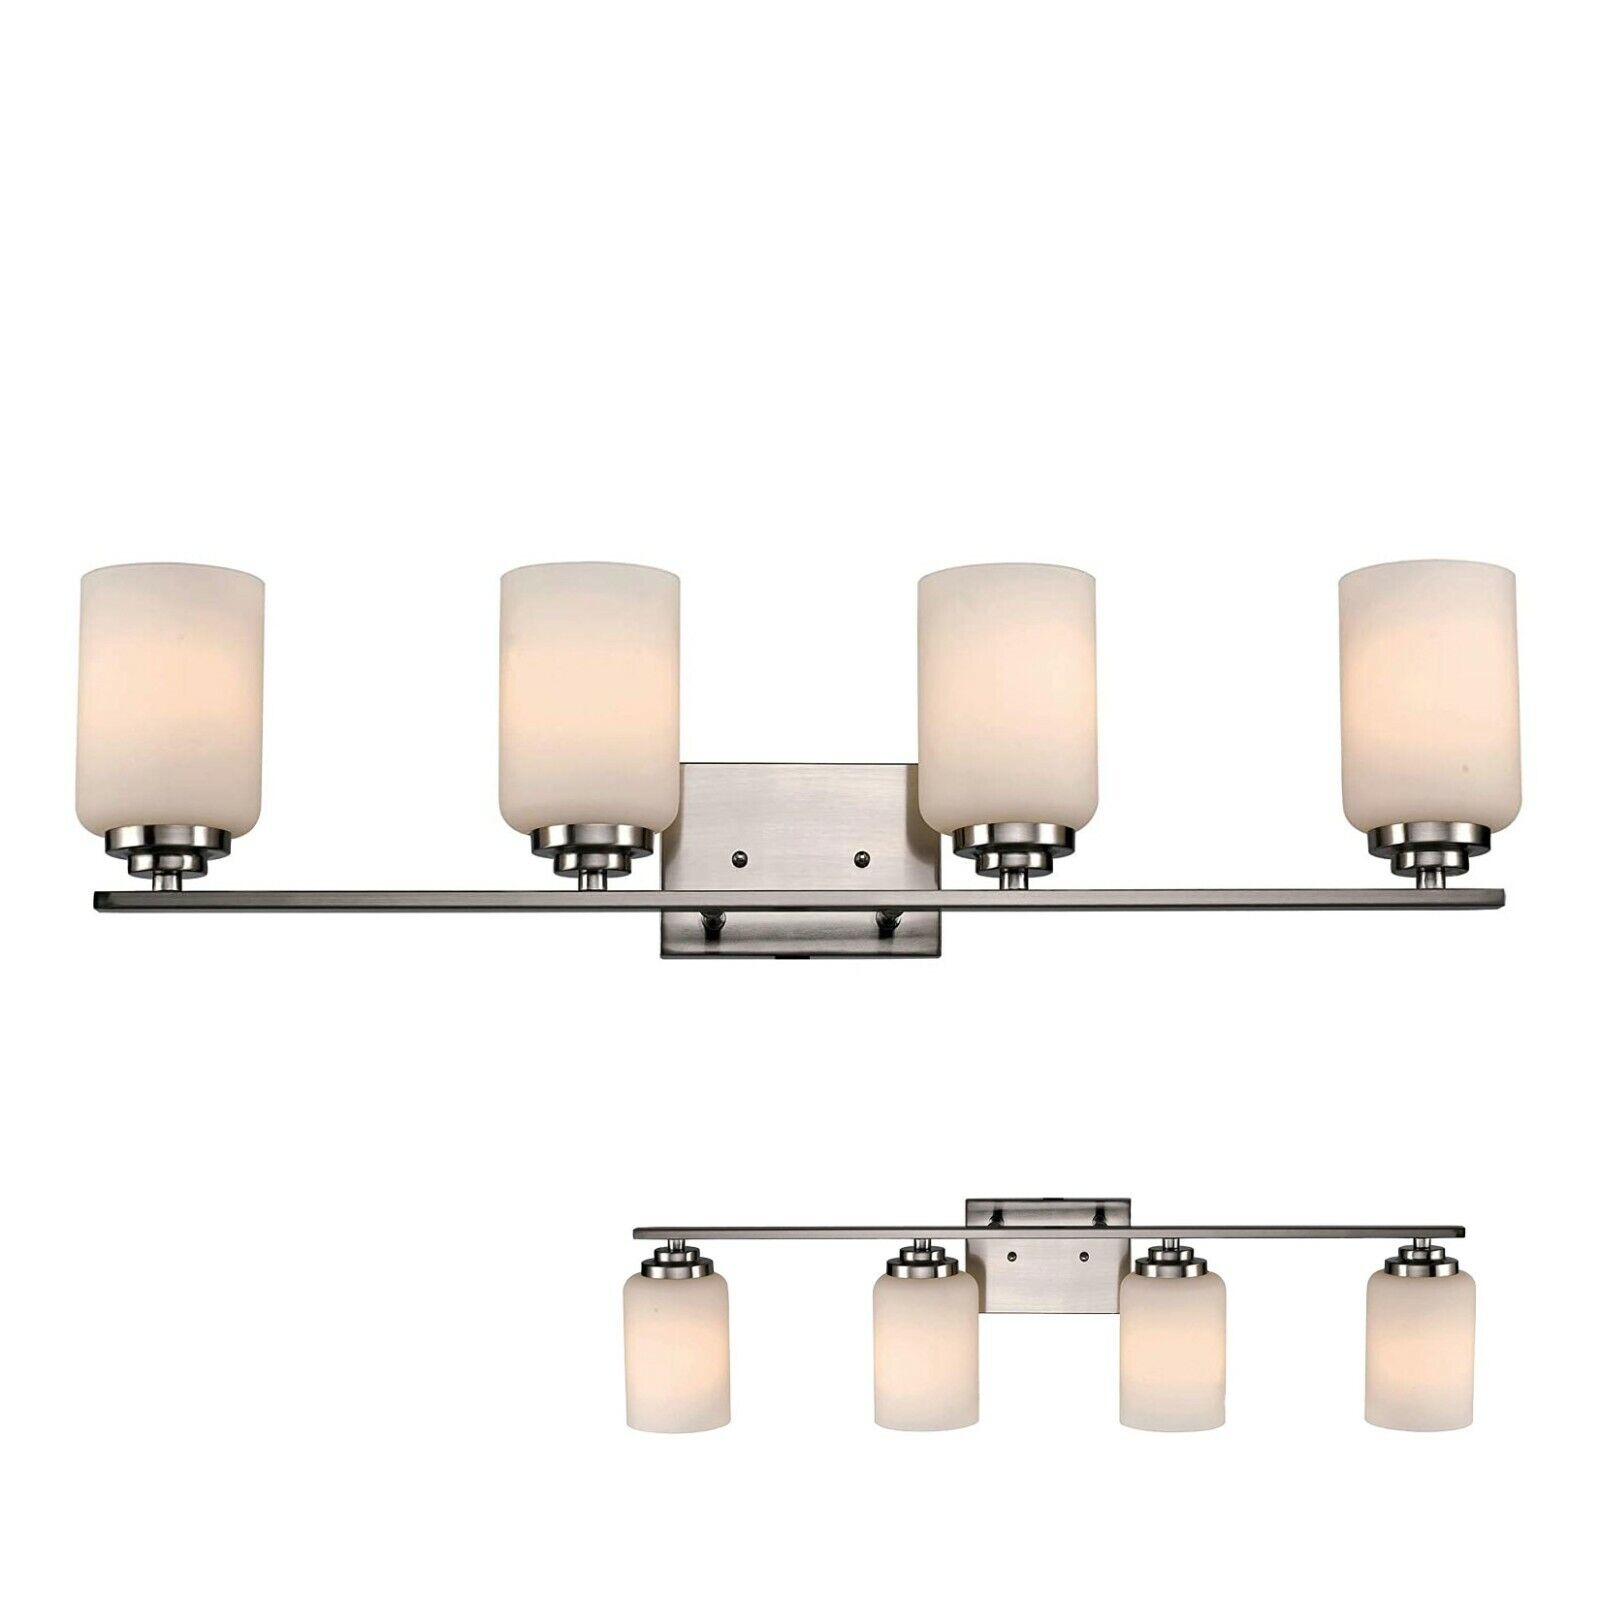 4-Bulb Bathroom Vanity Light Bar Fixture with White Glass Globes, Chrome Home & Garden